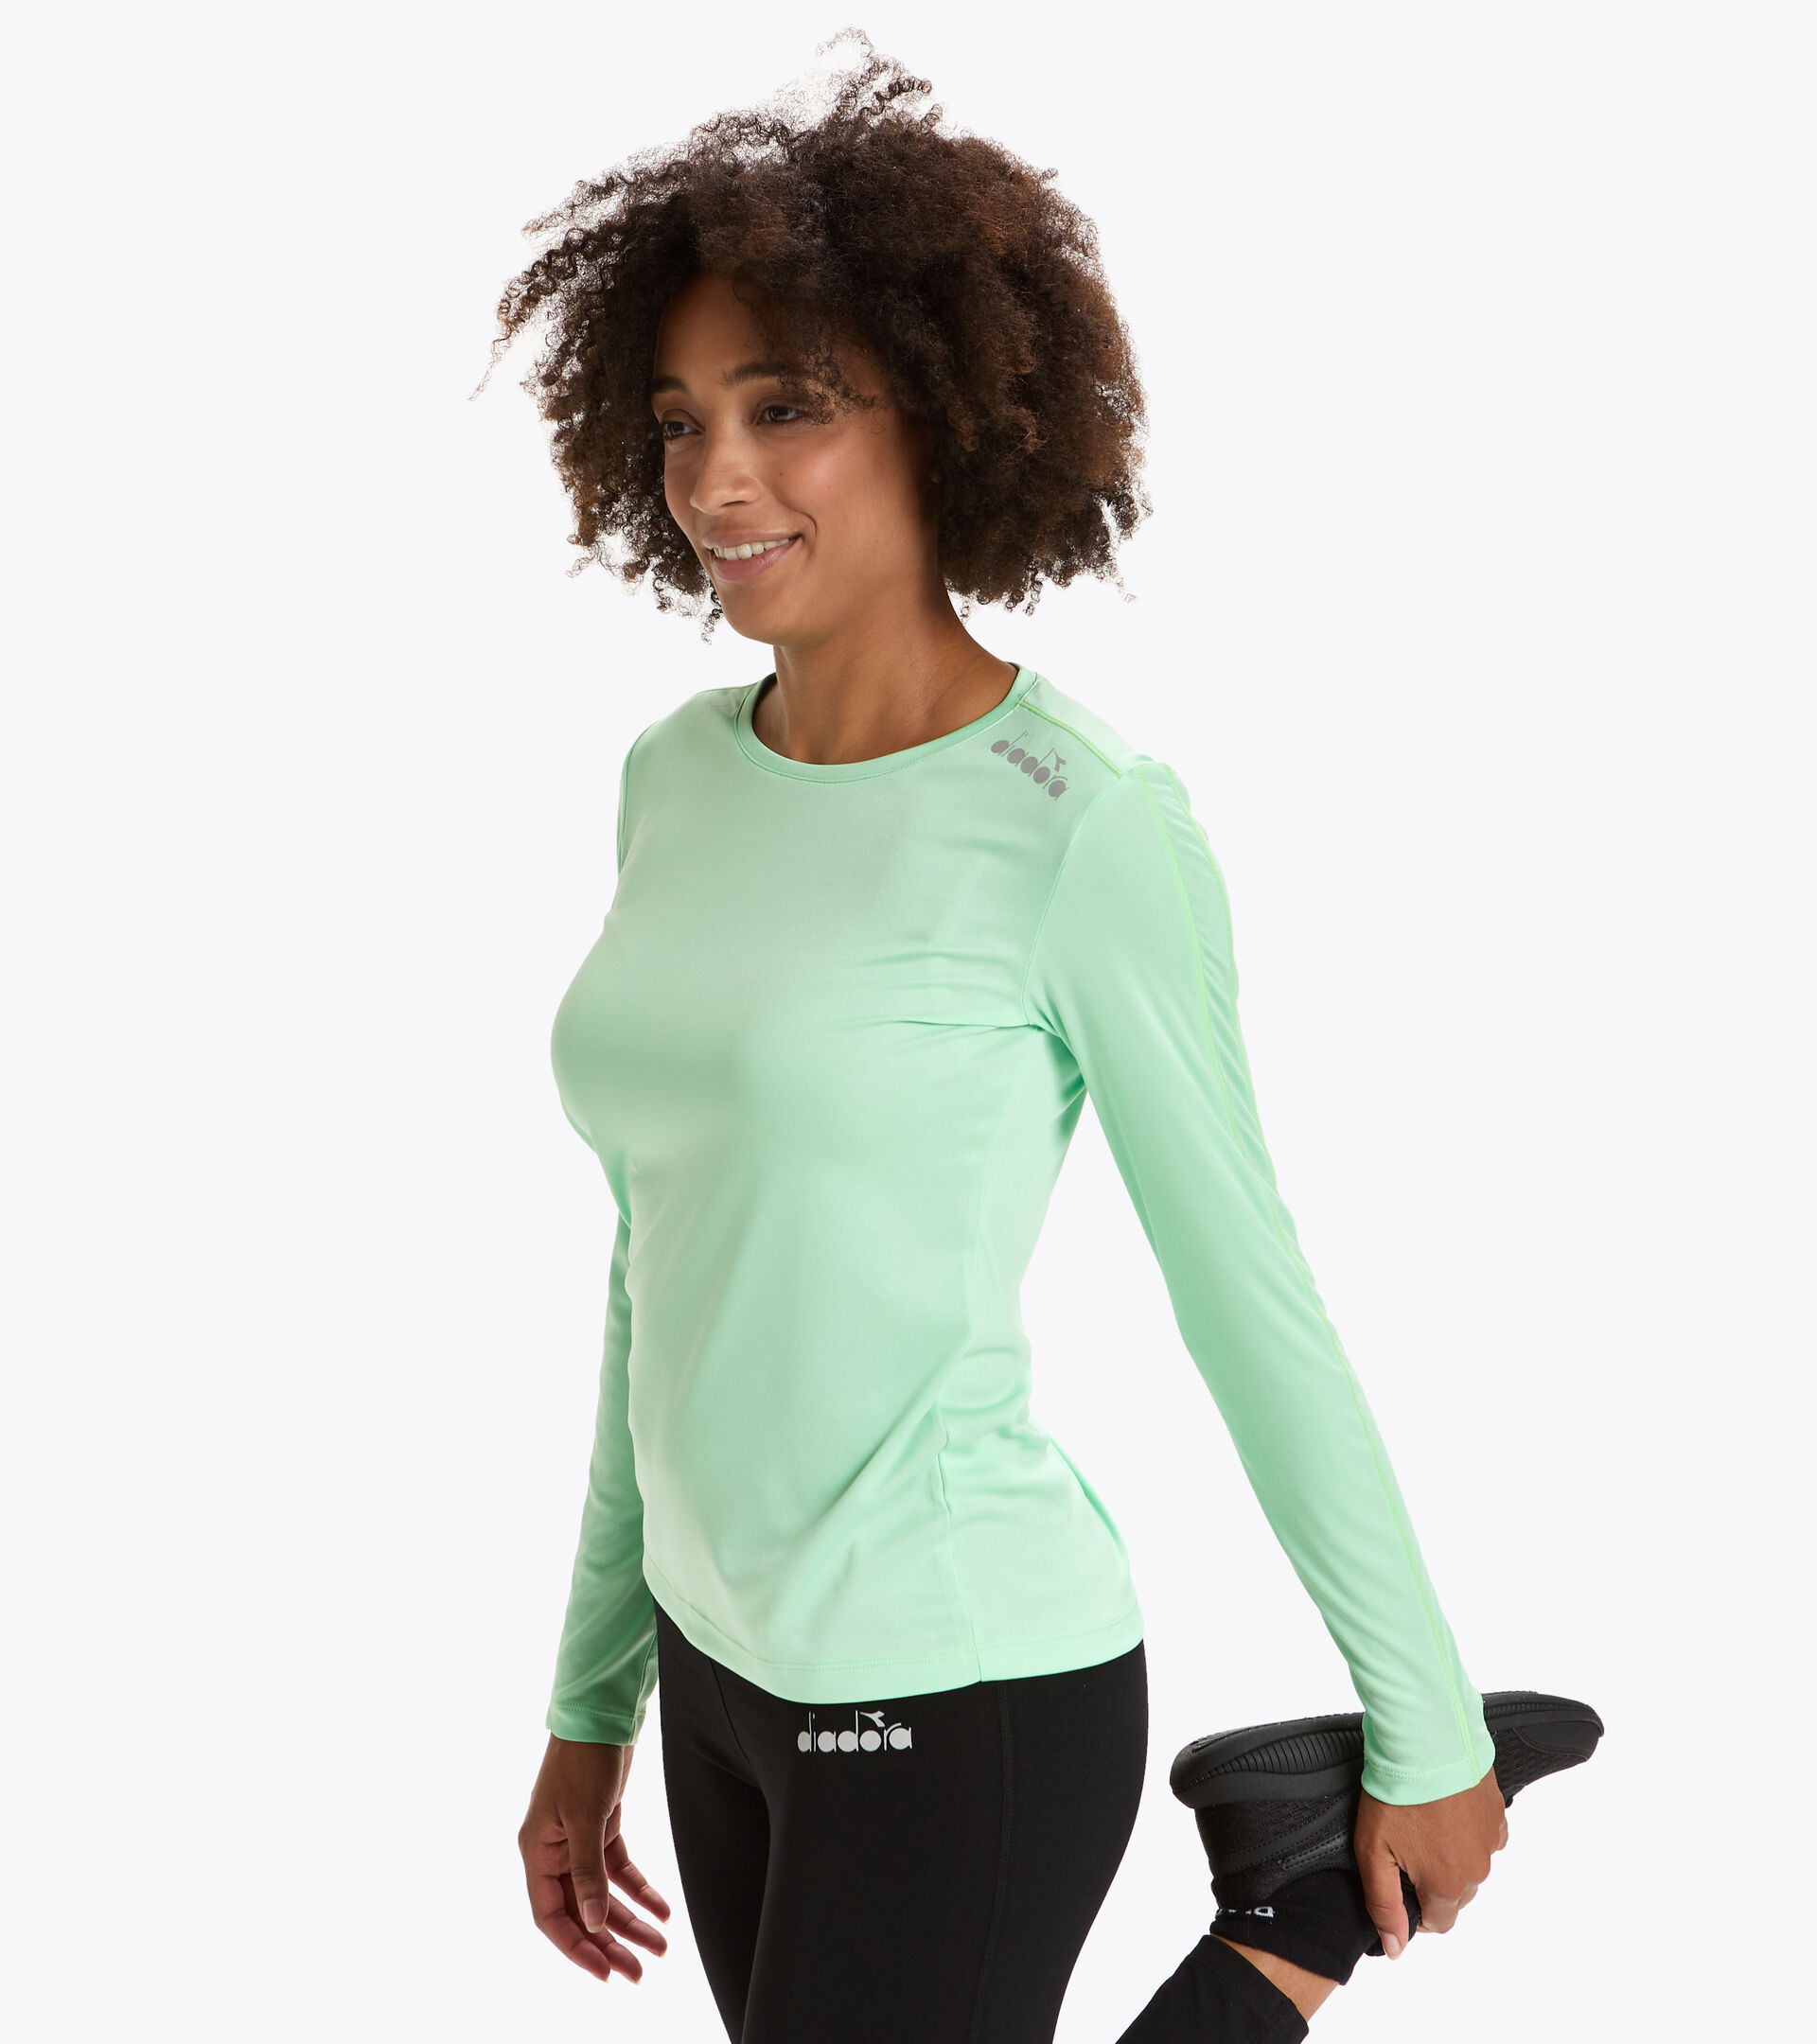 Camiseta para correr - Mujer L. LS CORE TEE VERDE FRESNO - Diadora